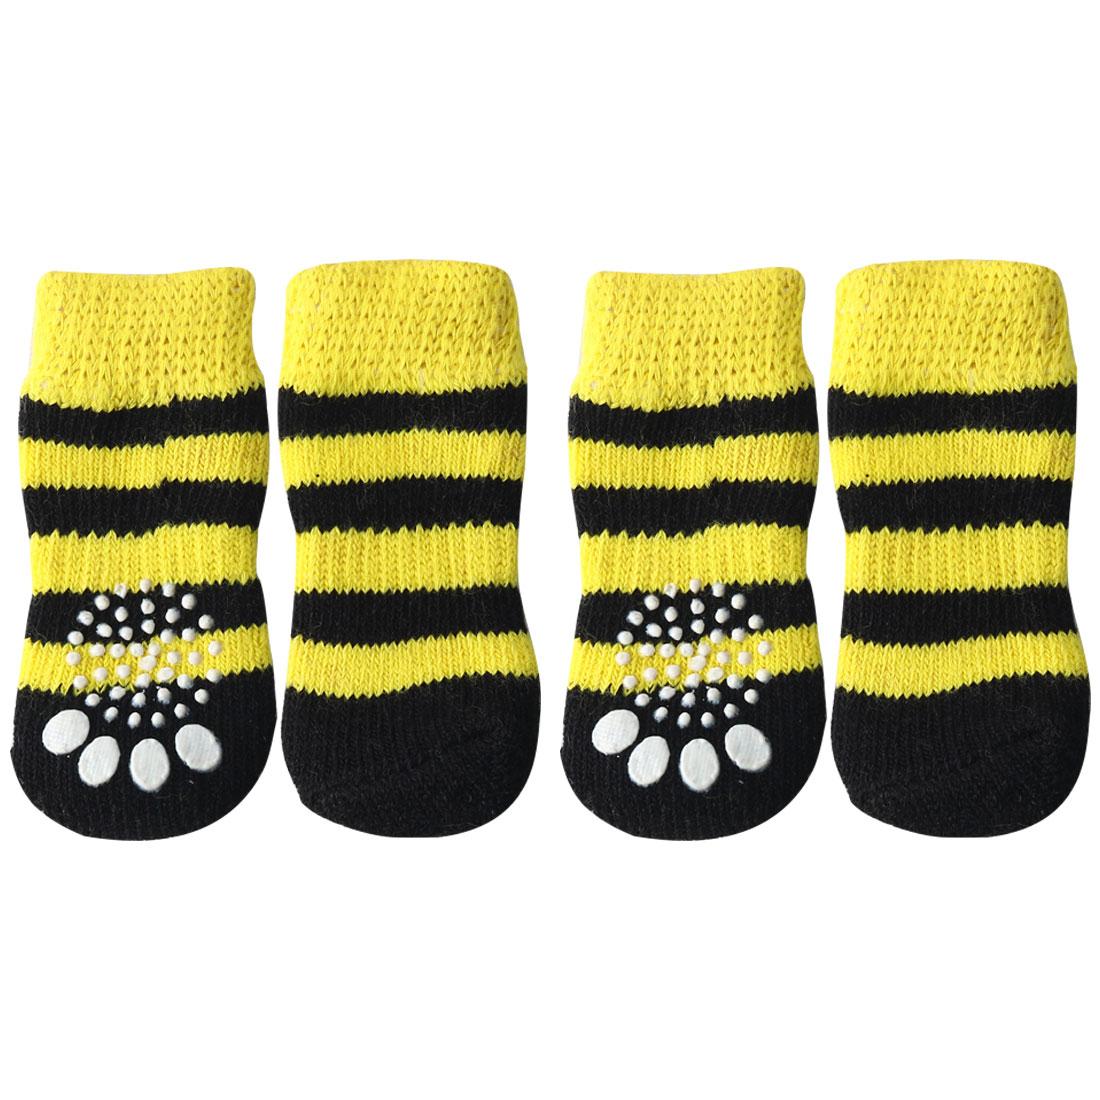 4 PCS Puppy Dog Cat Socks Warm Anti-Slip Knit Paw Protector Black + Yellow, M